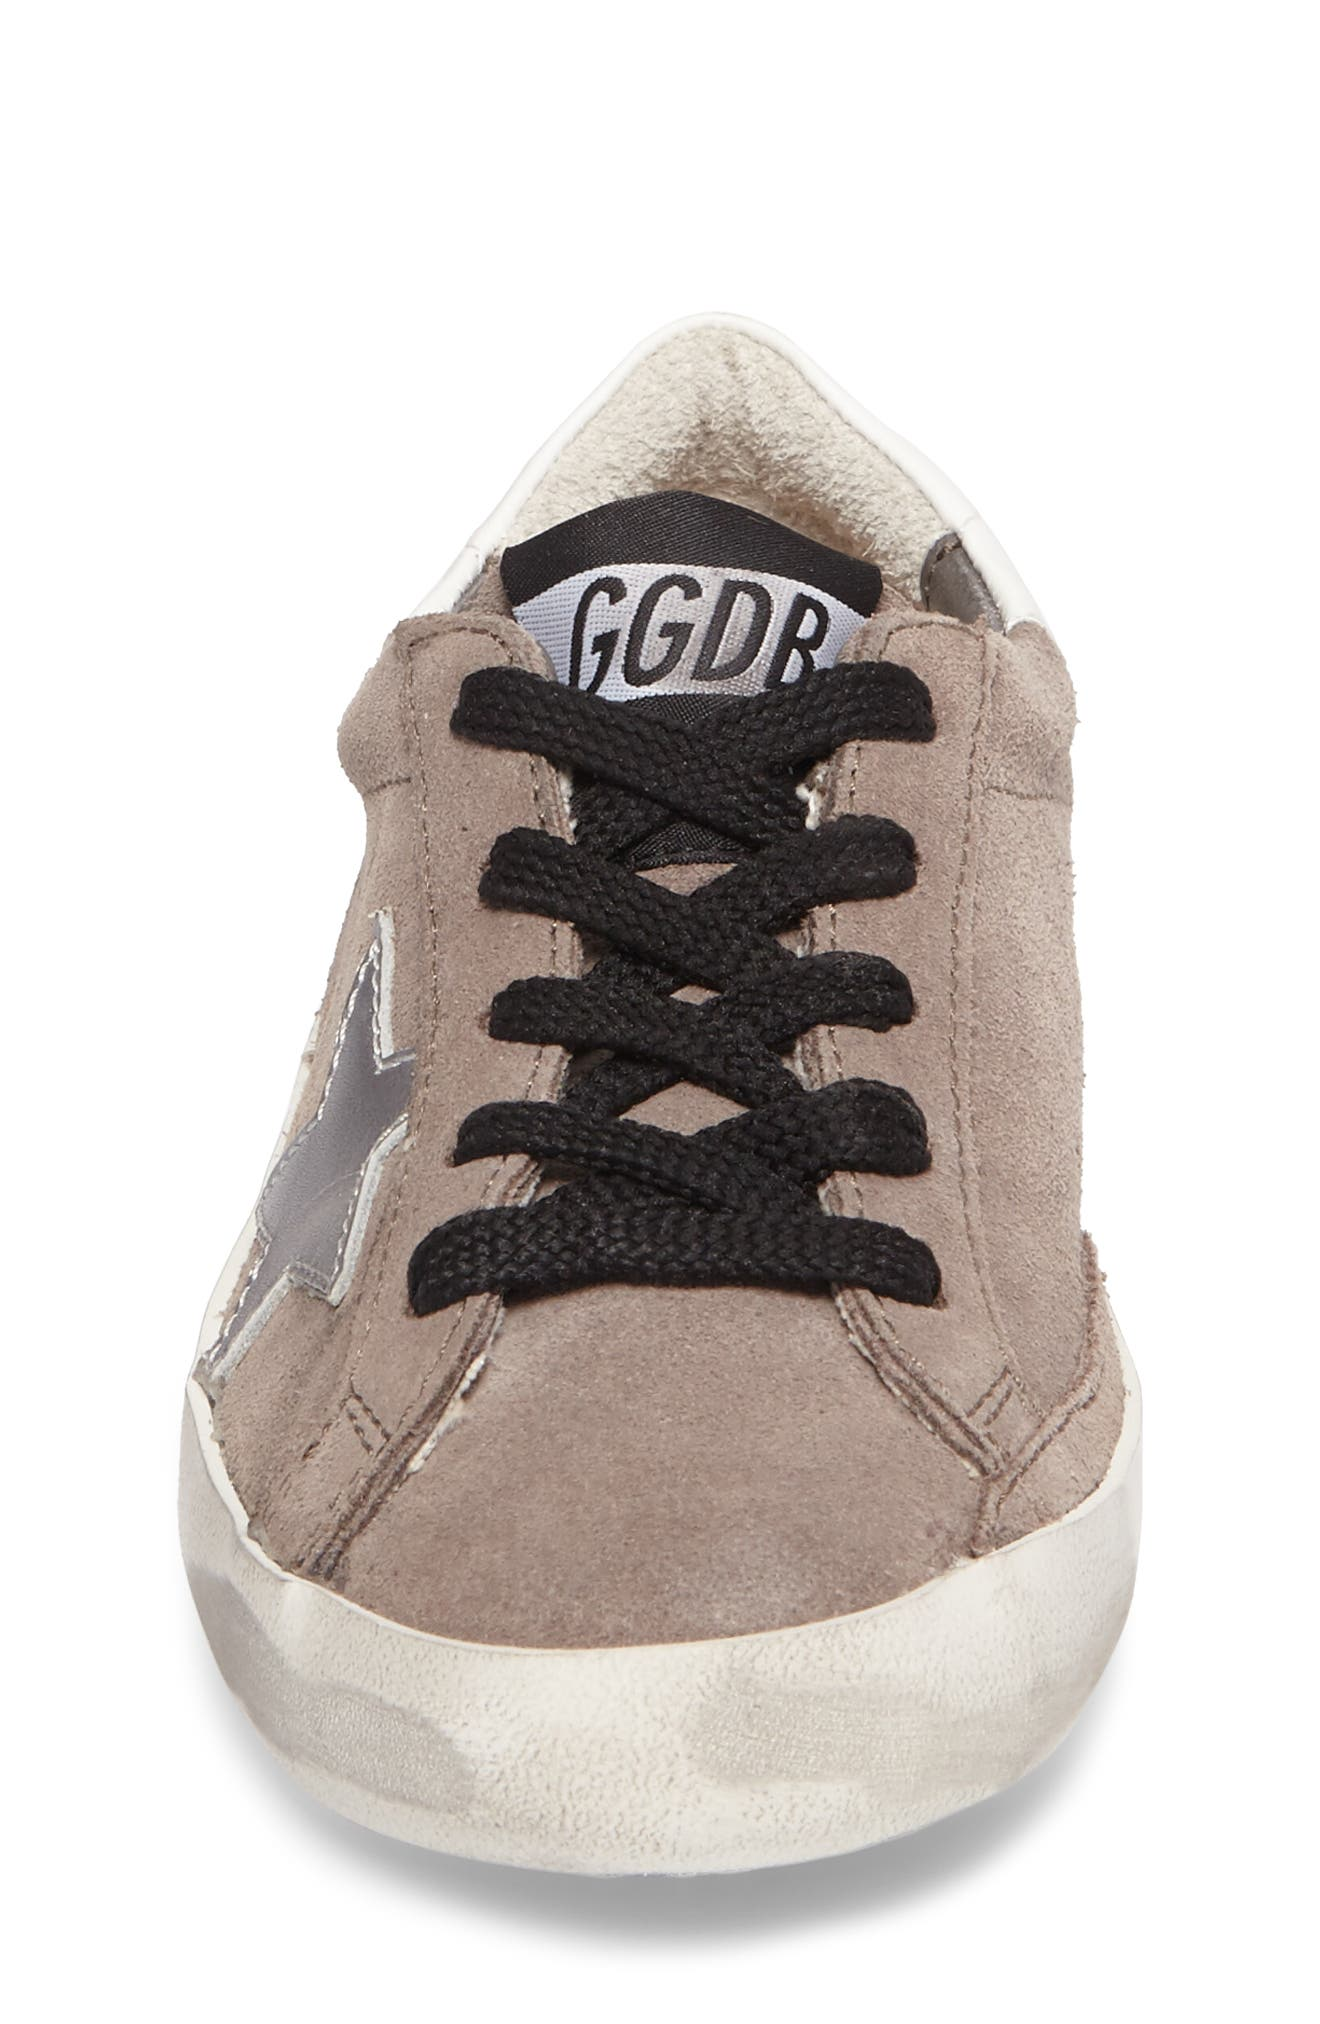 Superstar Low Top Sneaker,                             Alternate thumbnail 4, color,                             030